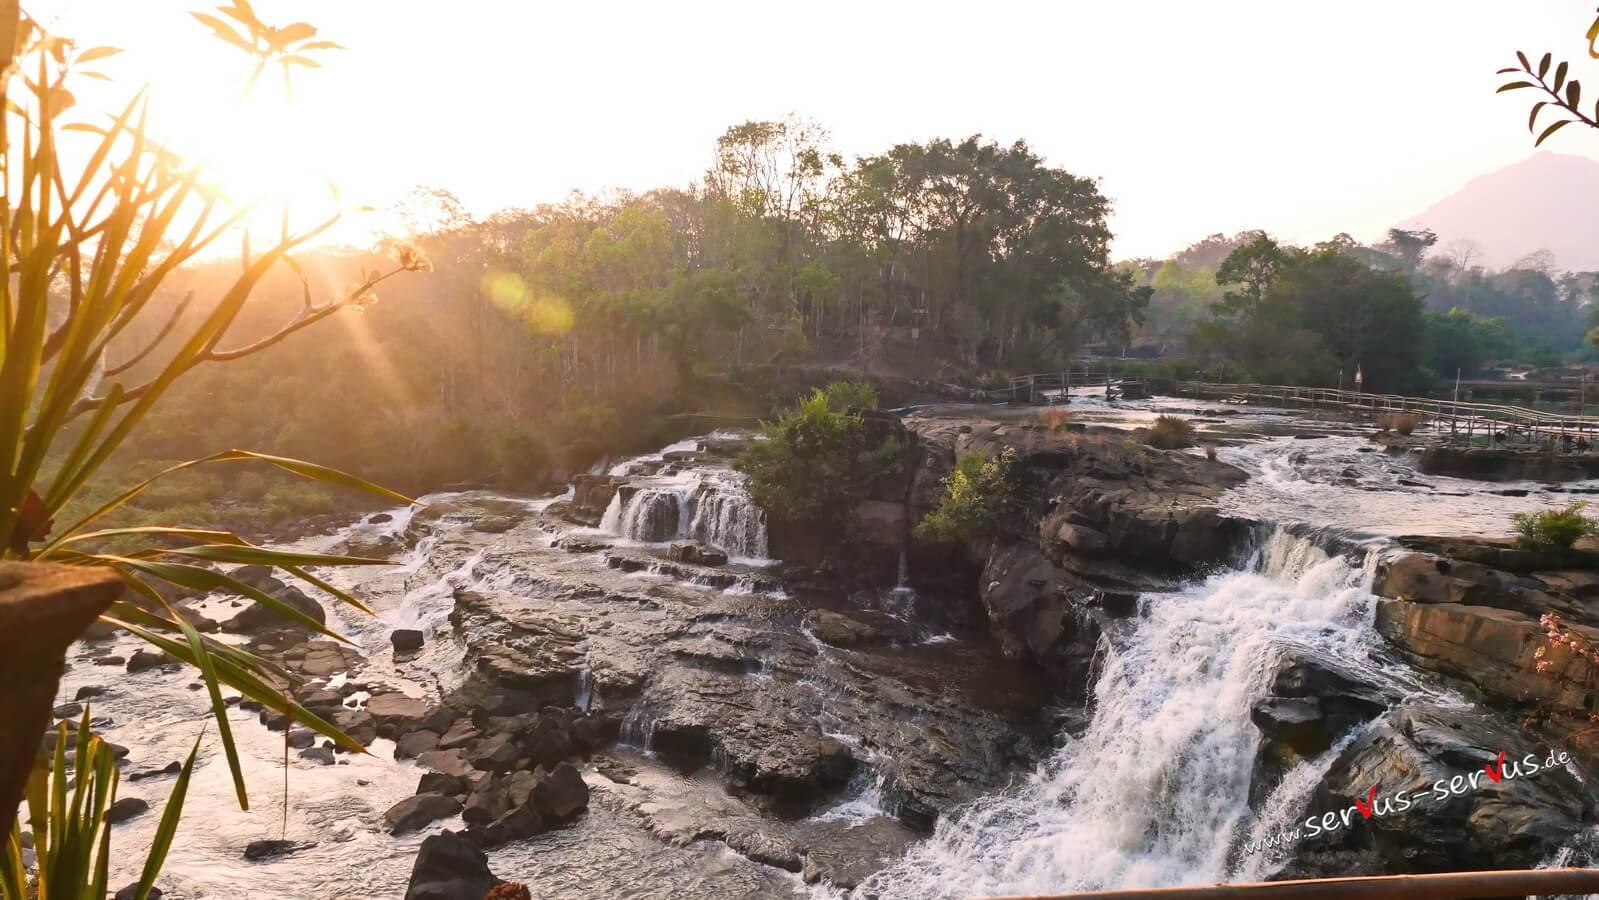 Wasserfall am Morgen, Tad Lo, Bolavenplateau